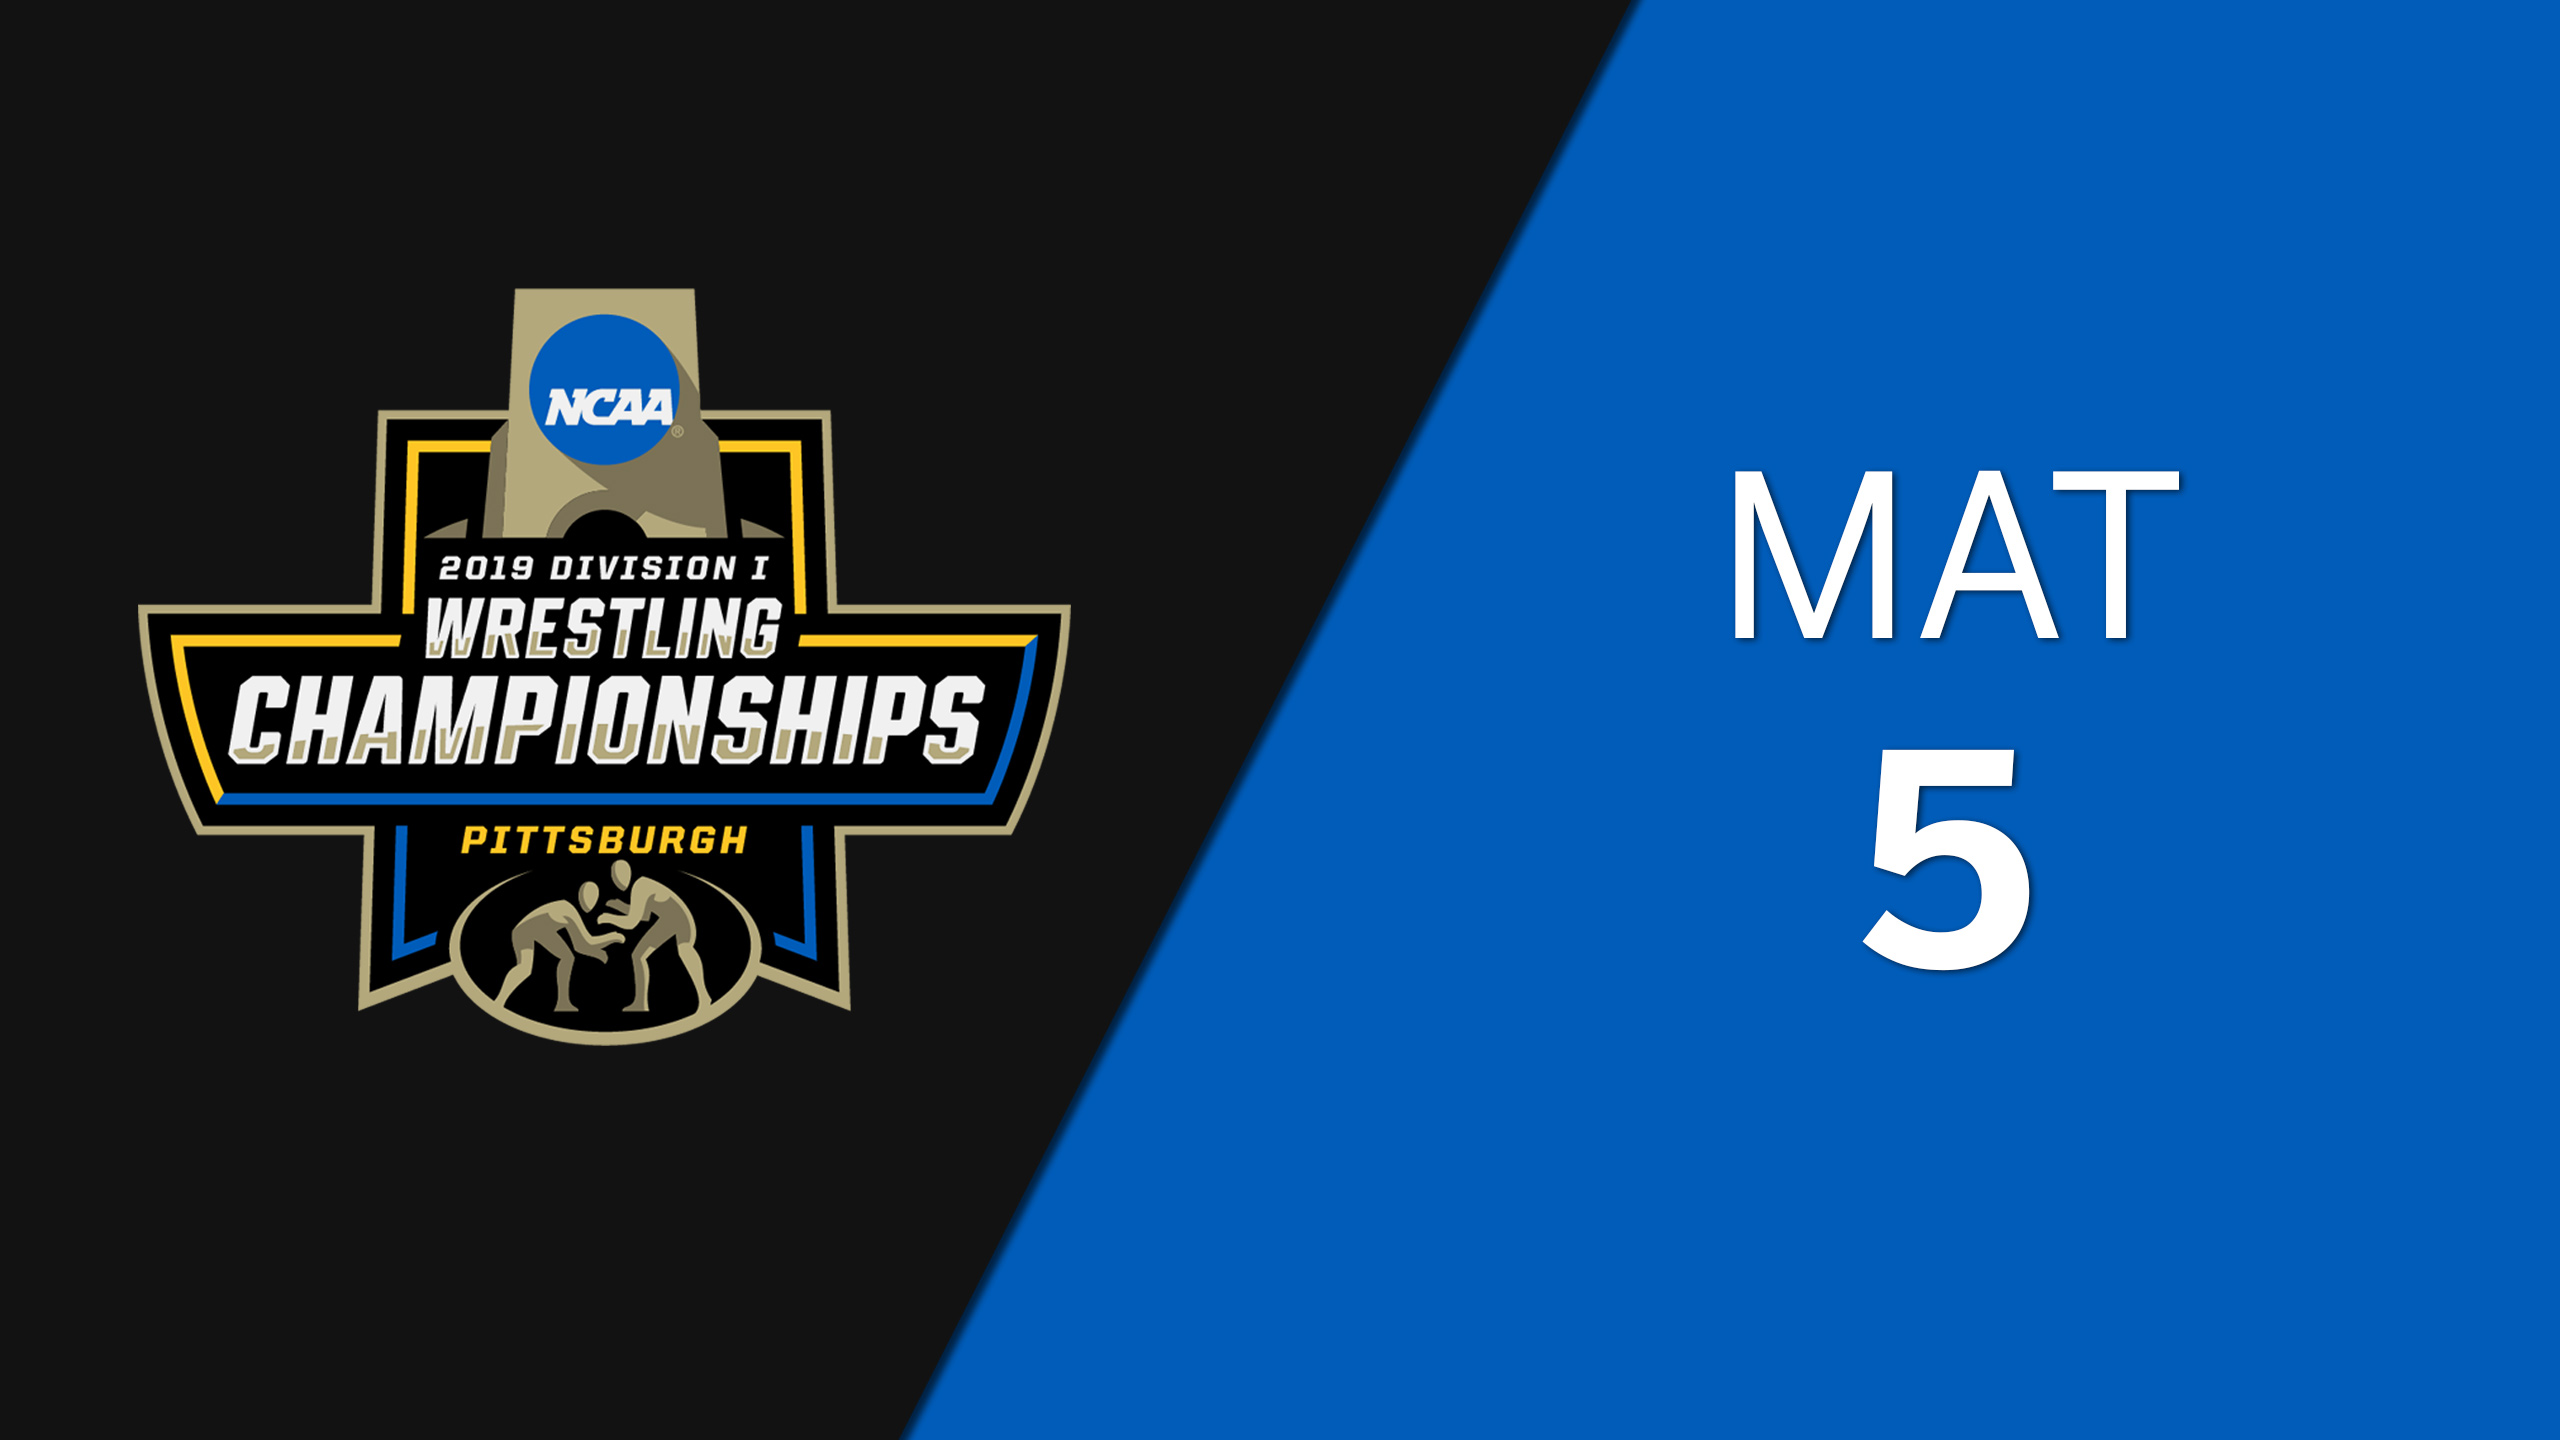 NCAA Wrestling Championship (Mat 5, Semifinals)